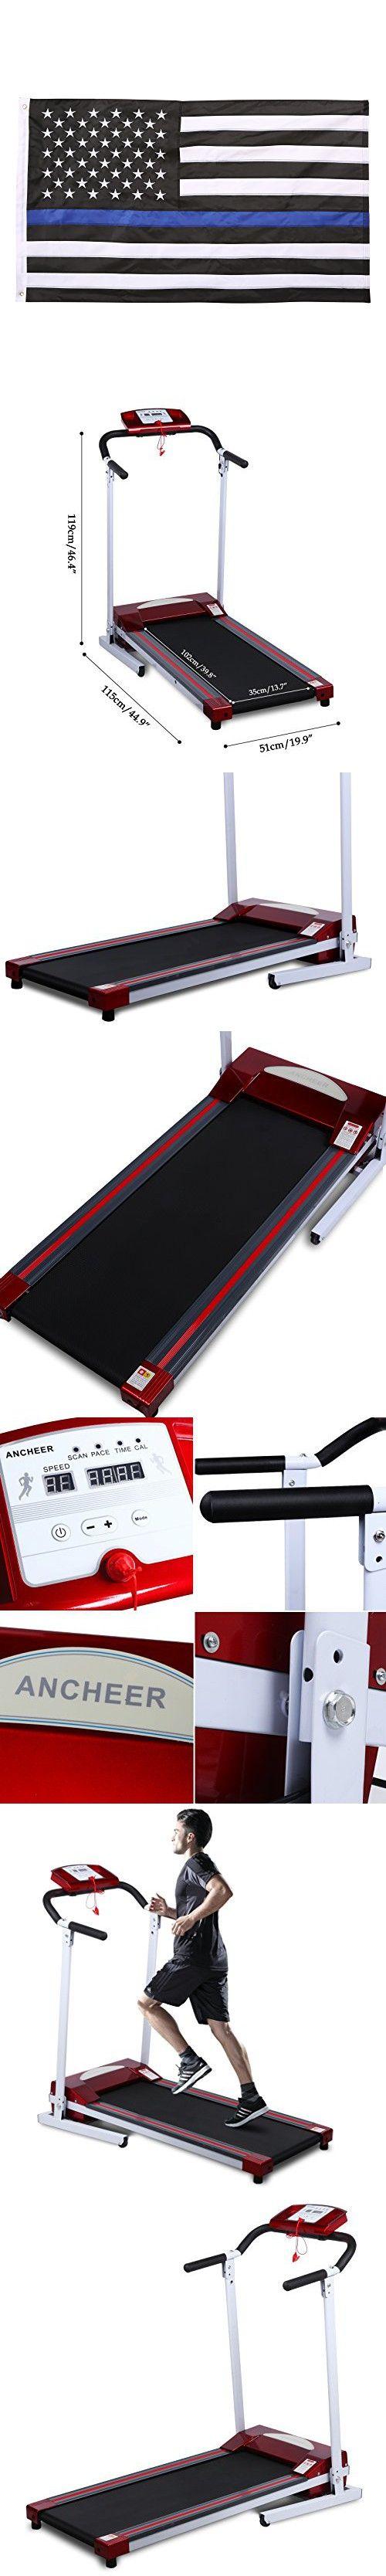 Ancheer Folding Treadmill Electric Fitness Running Machine 3.0